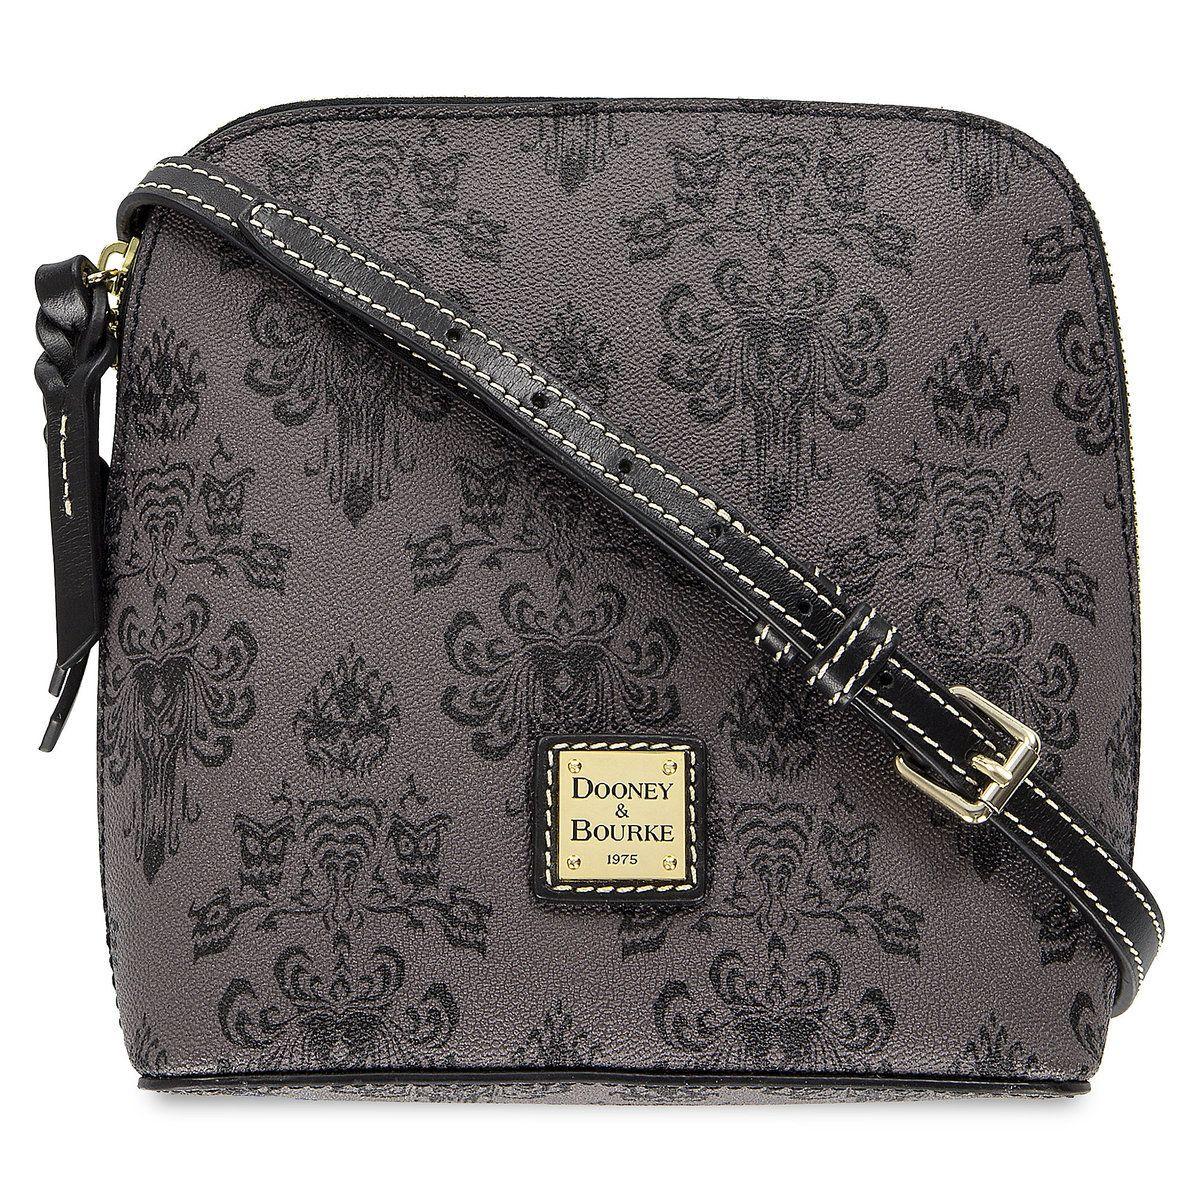 Haunted Mansion Dooney Bourke Handbags Are Now On Shopdisney Dooney Bourke Handbags Dooney Bourke Dooney And Bourke Disney